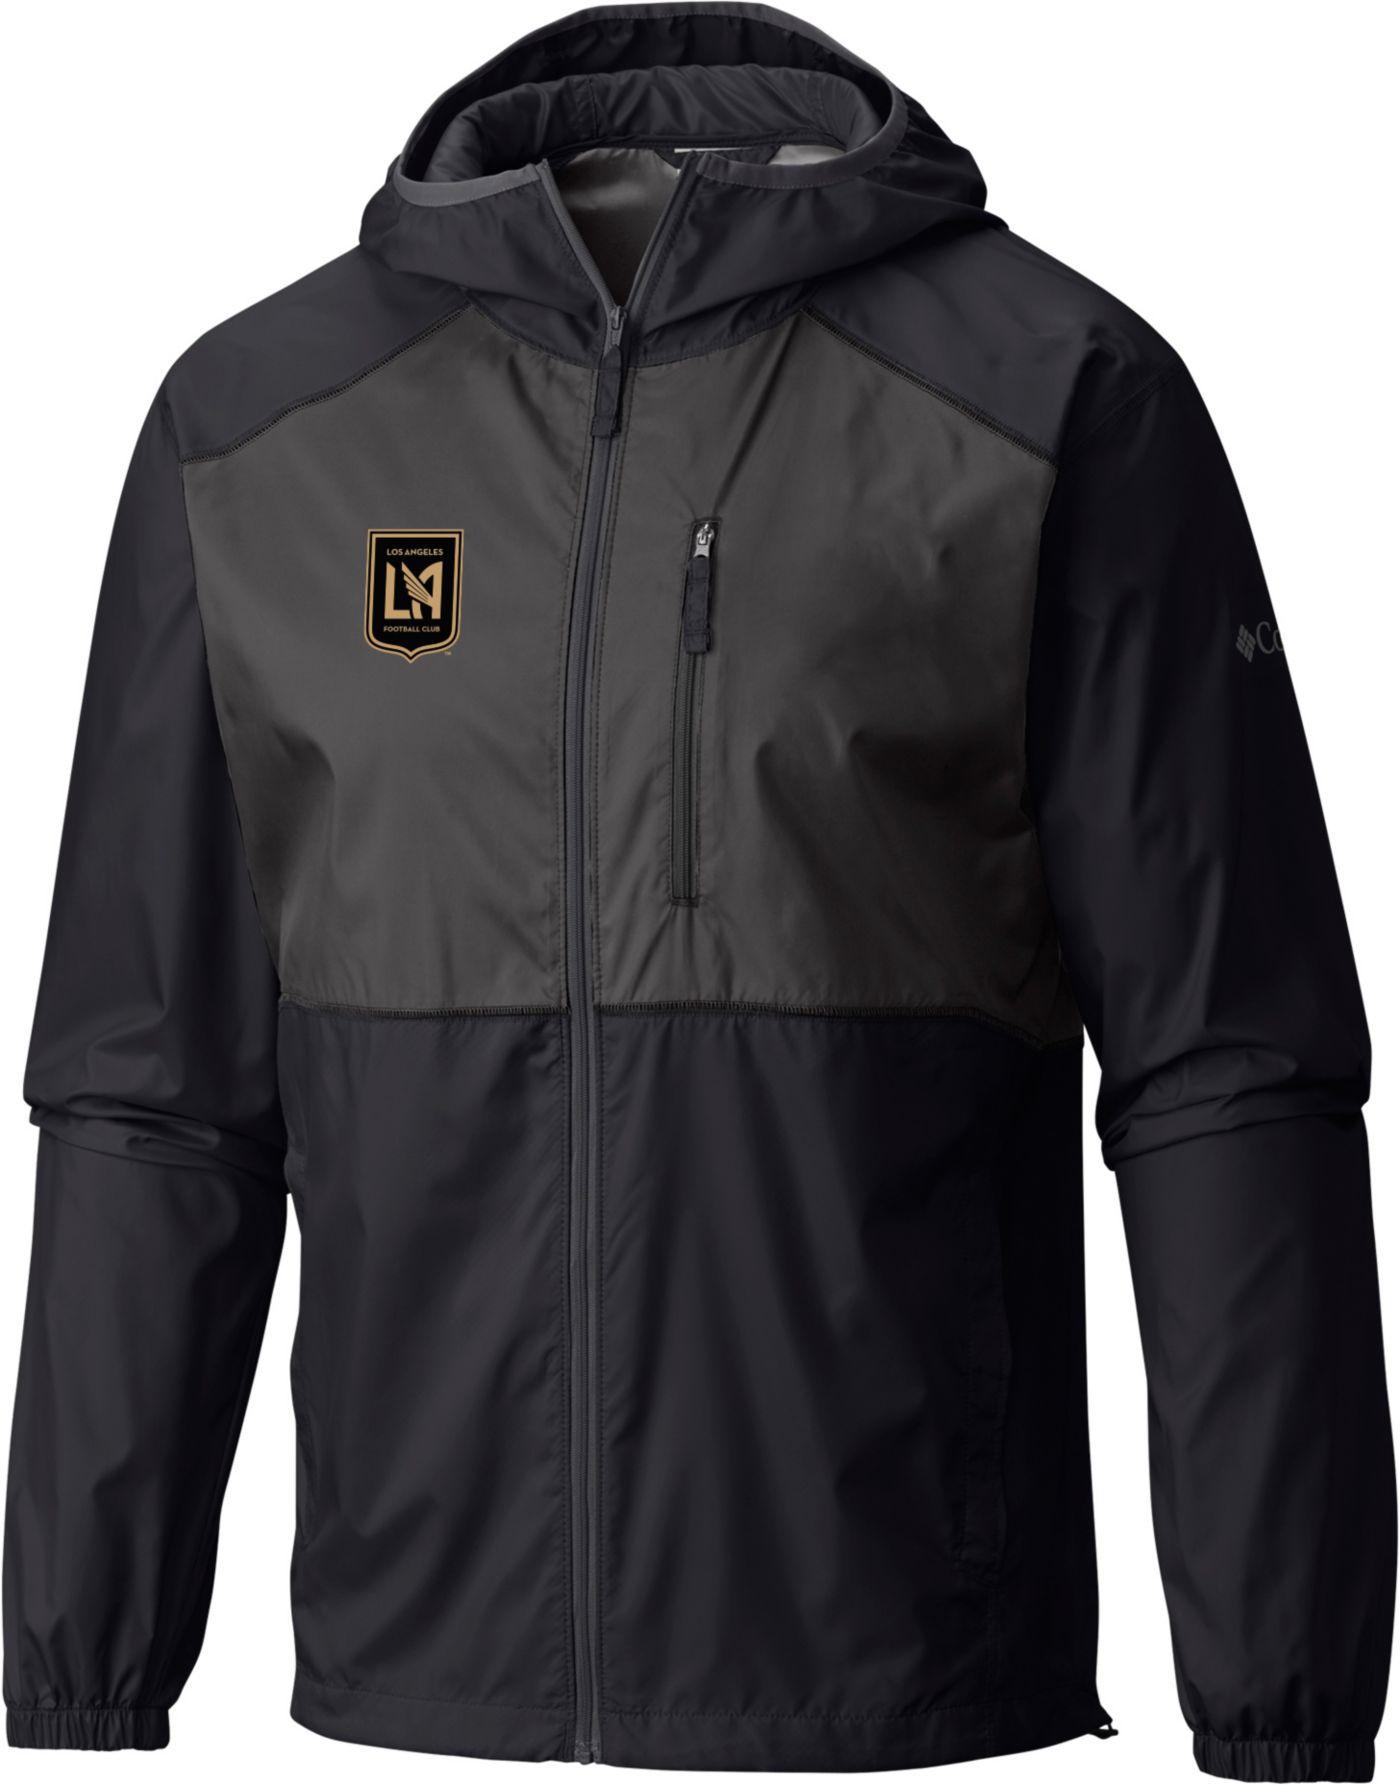 Columbia Men's Los Angeles FC Flash Forward Black Full-Zip Windbreaker Jacket